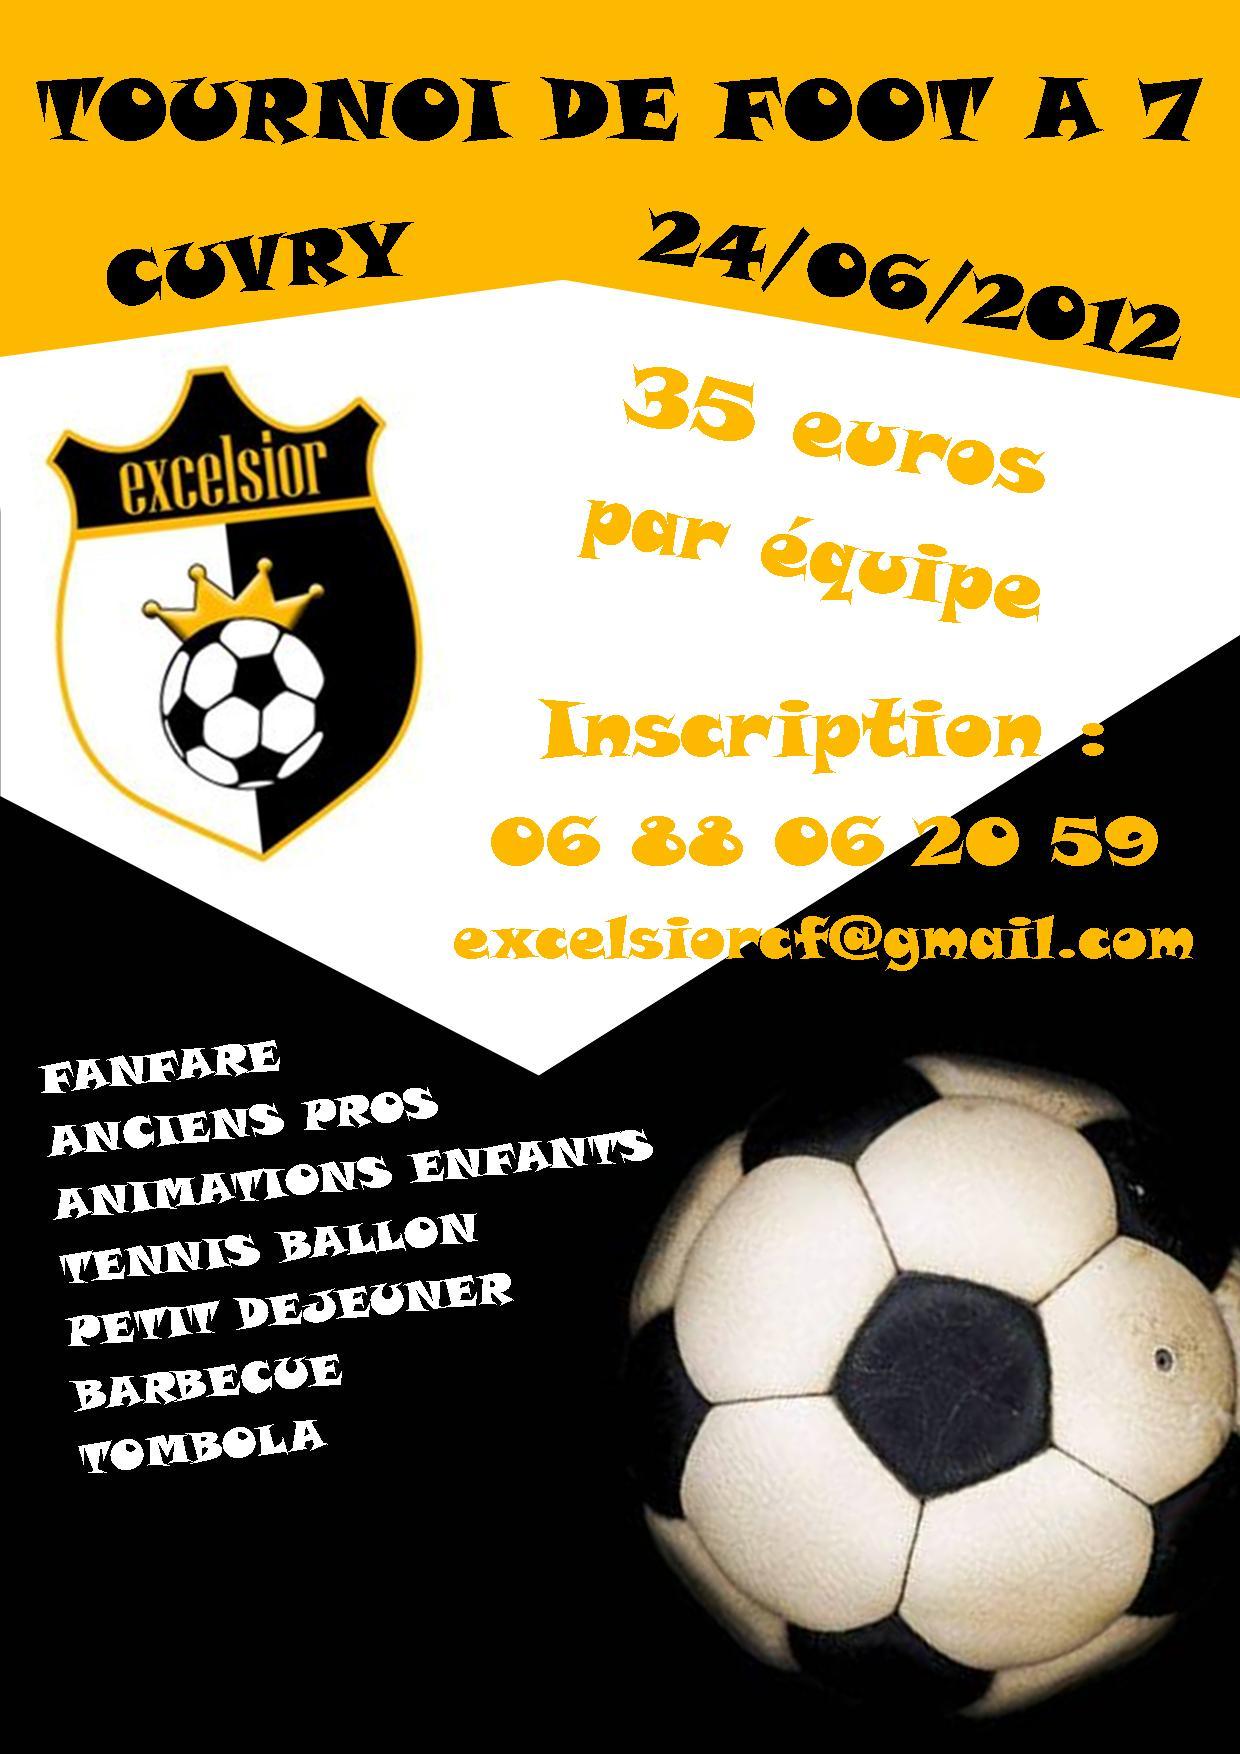 affiche tournoi excelsior 2012